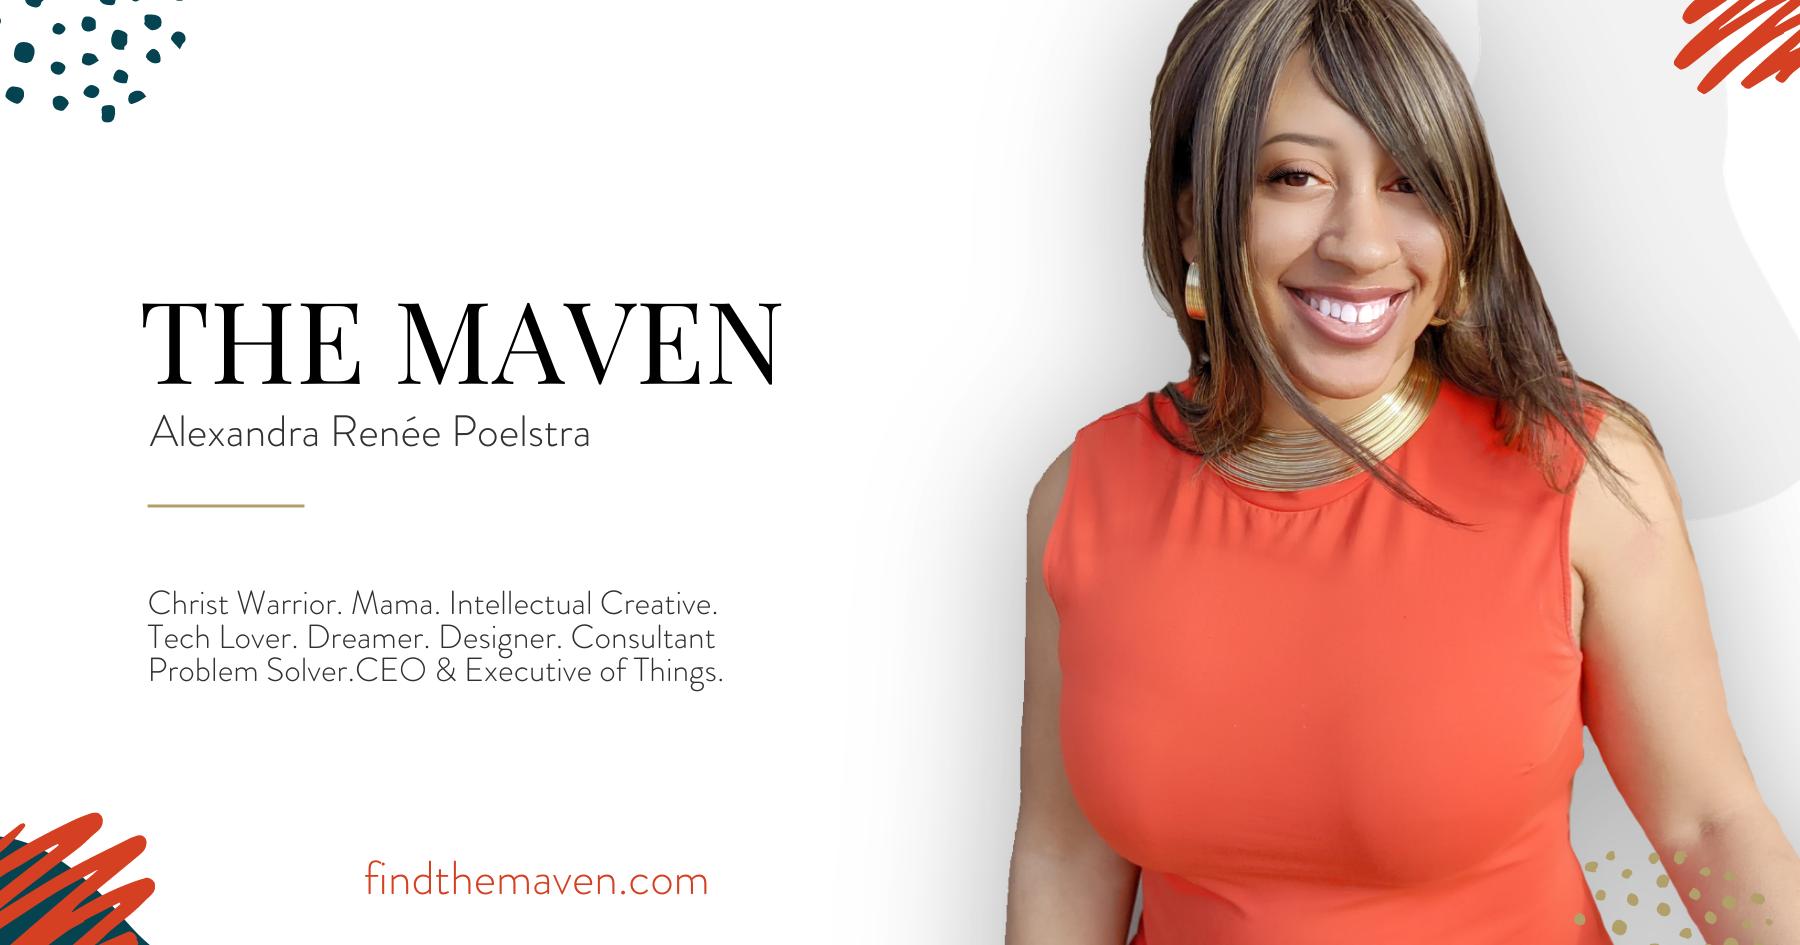 #findthemaven - Alexandra Renee Poelstra - THE MAVEN